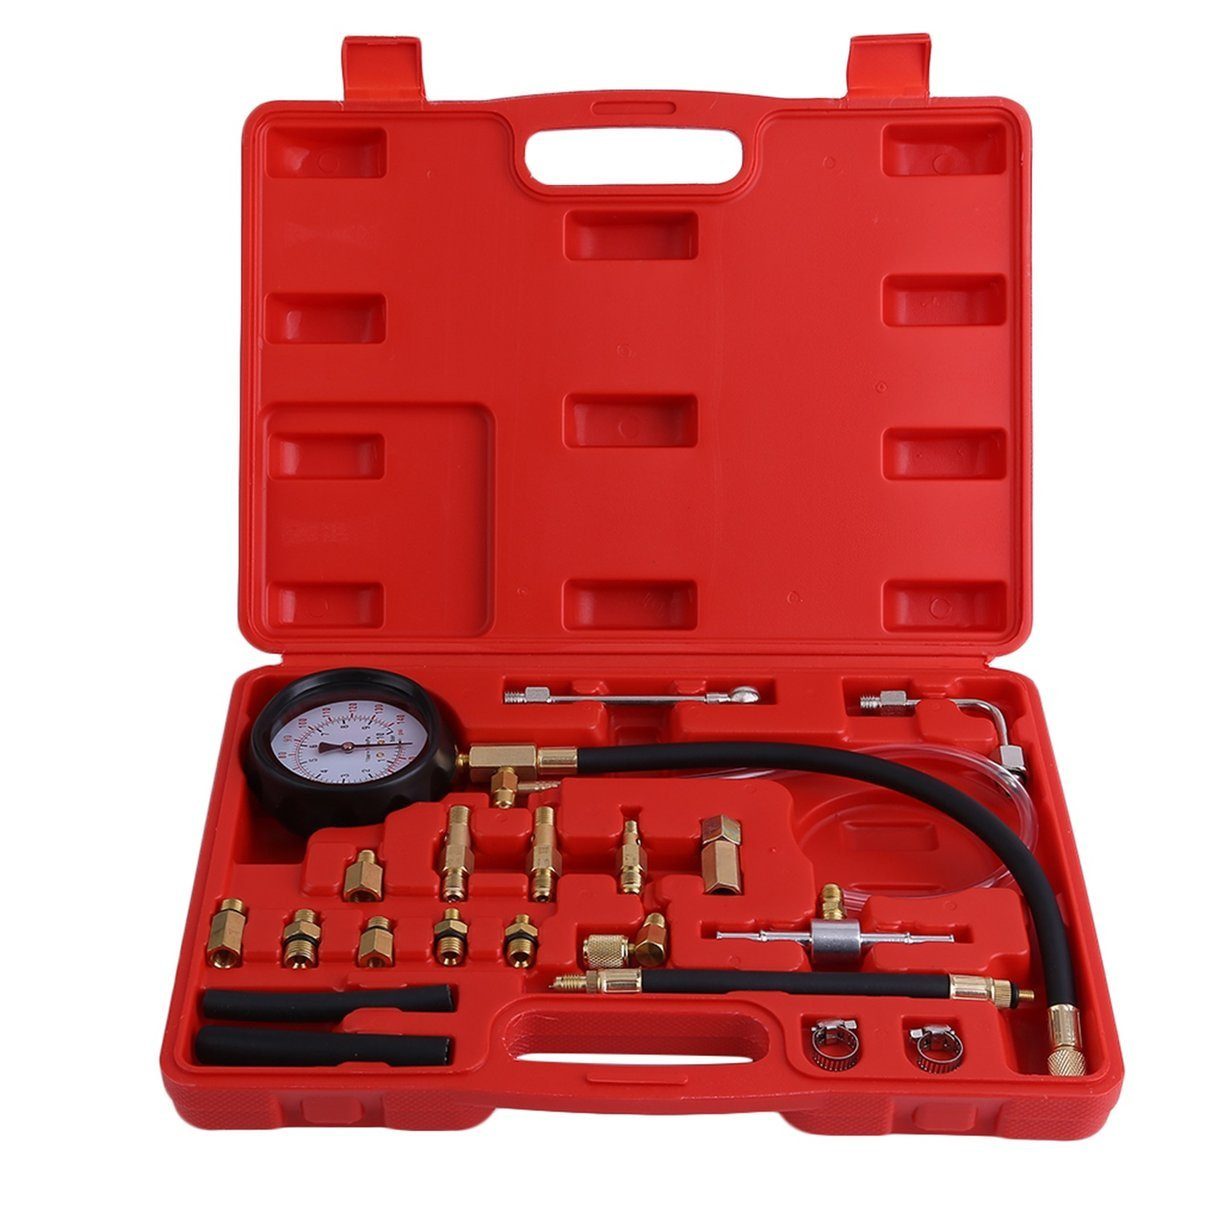 Jullyelegant 0-140 PSI Pompa iniezione iniettore Tester Misuratore di pressione Benzina Auto Vehicle Oil Combustion Spraying Diagnostics Tool